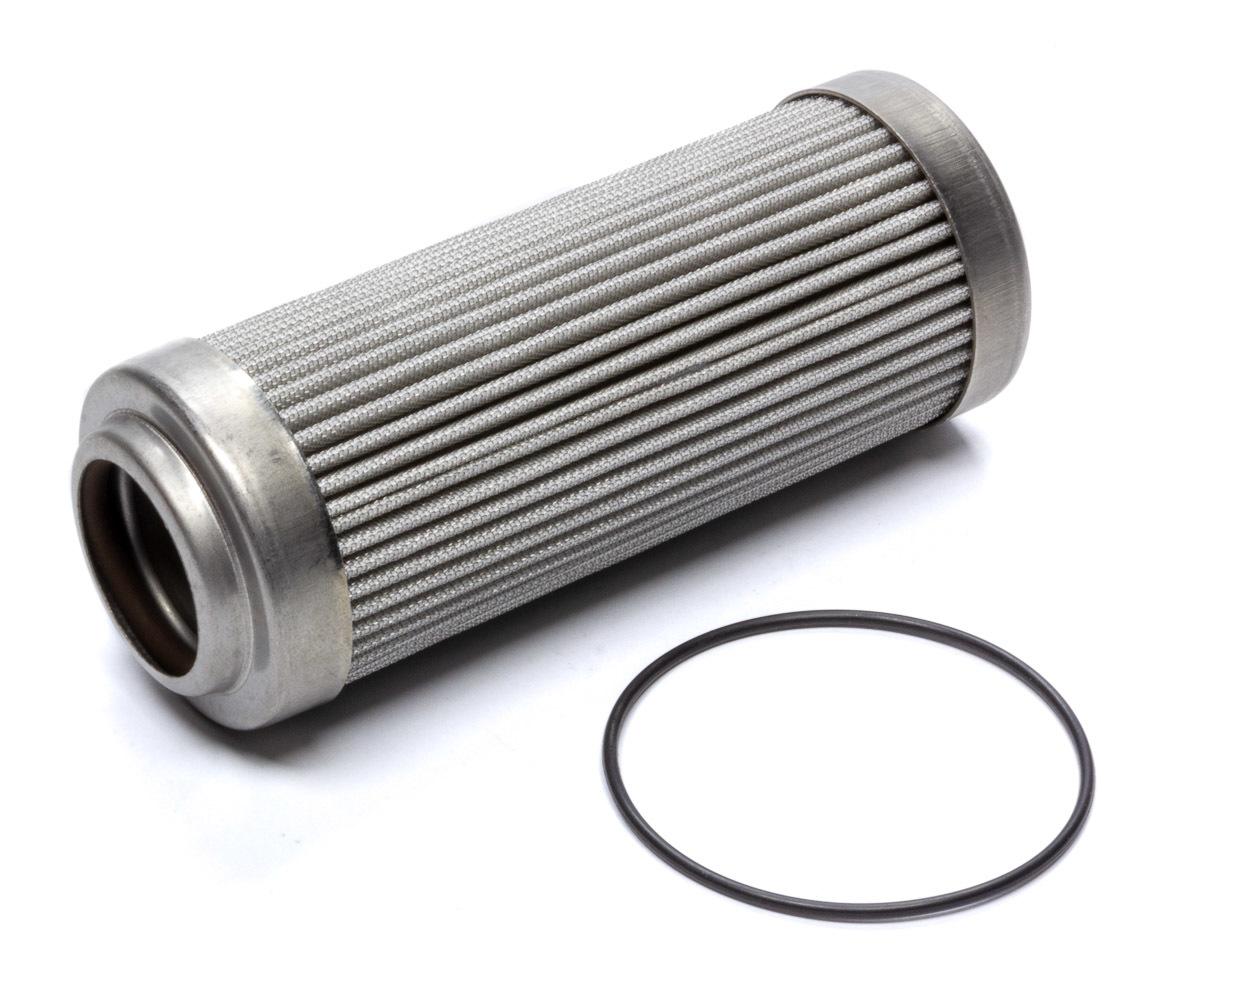 Aeromotive 12639 Fuel Filter Element, 10 Micron, Microglass Element, Aeromotive In-Line Fuel Filters, Each